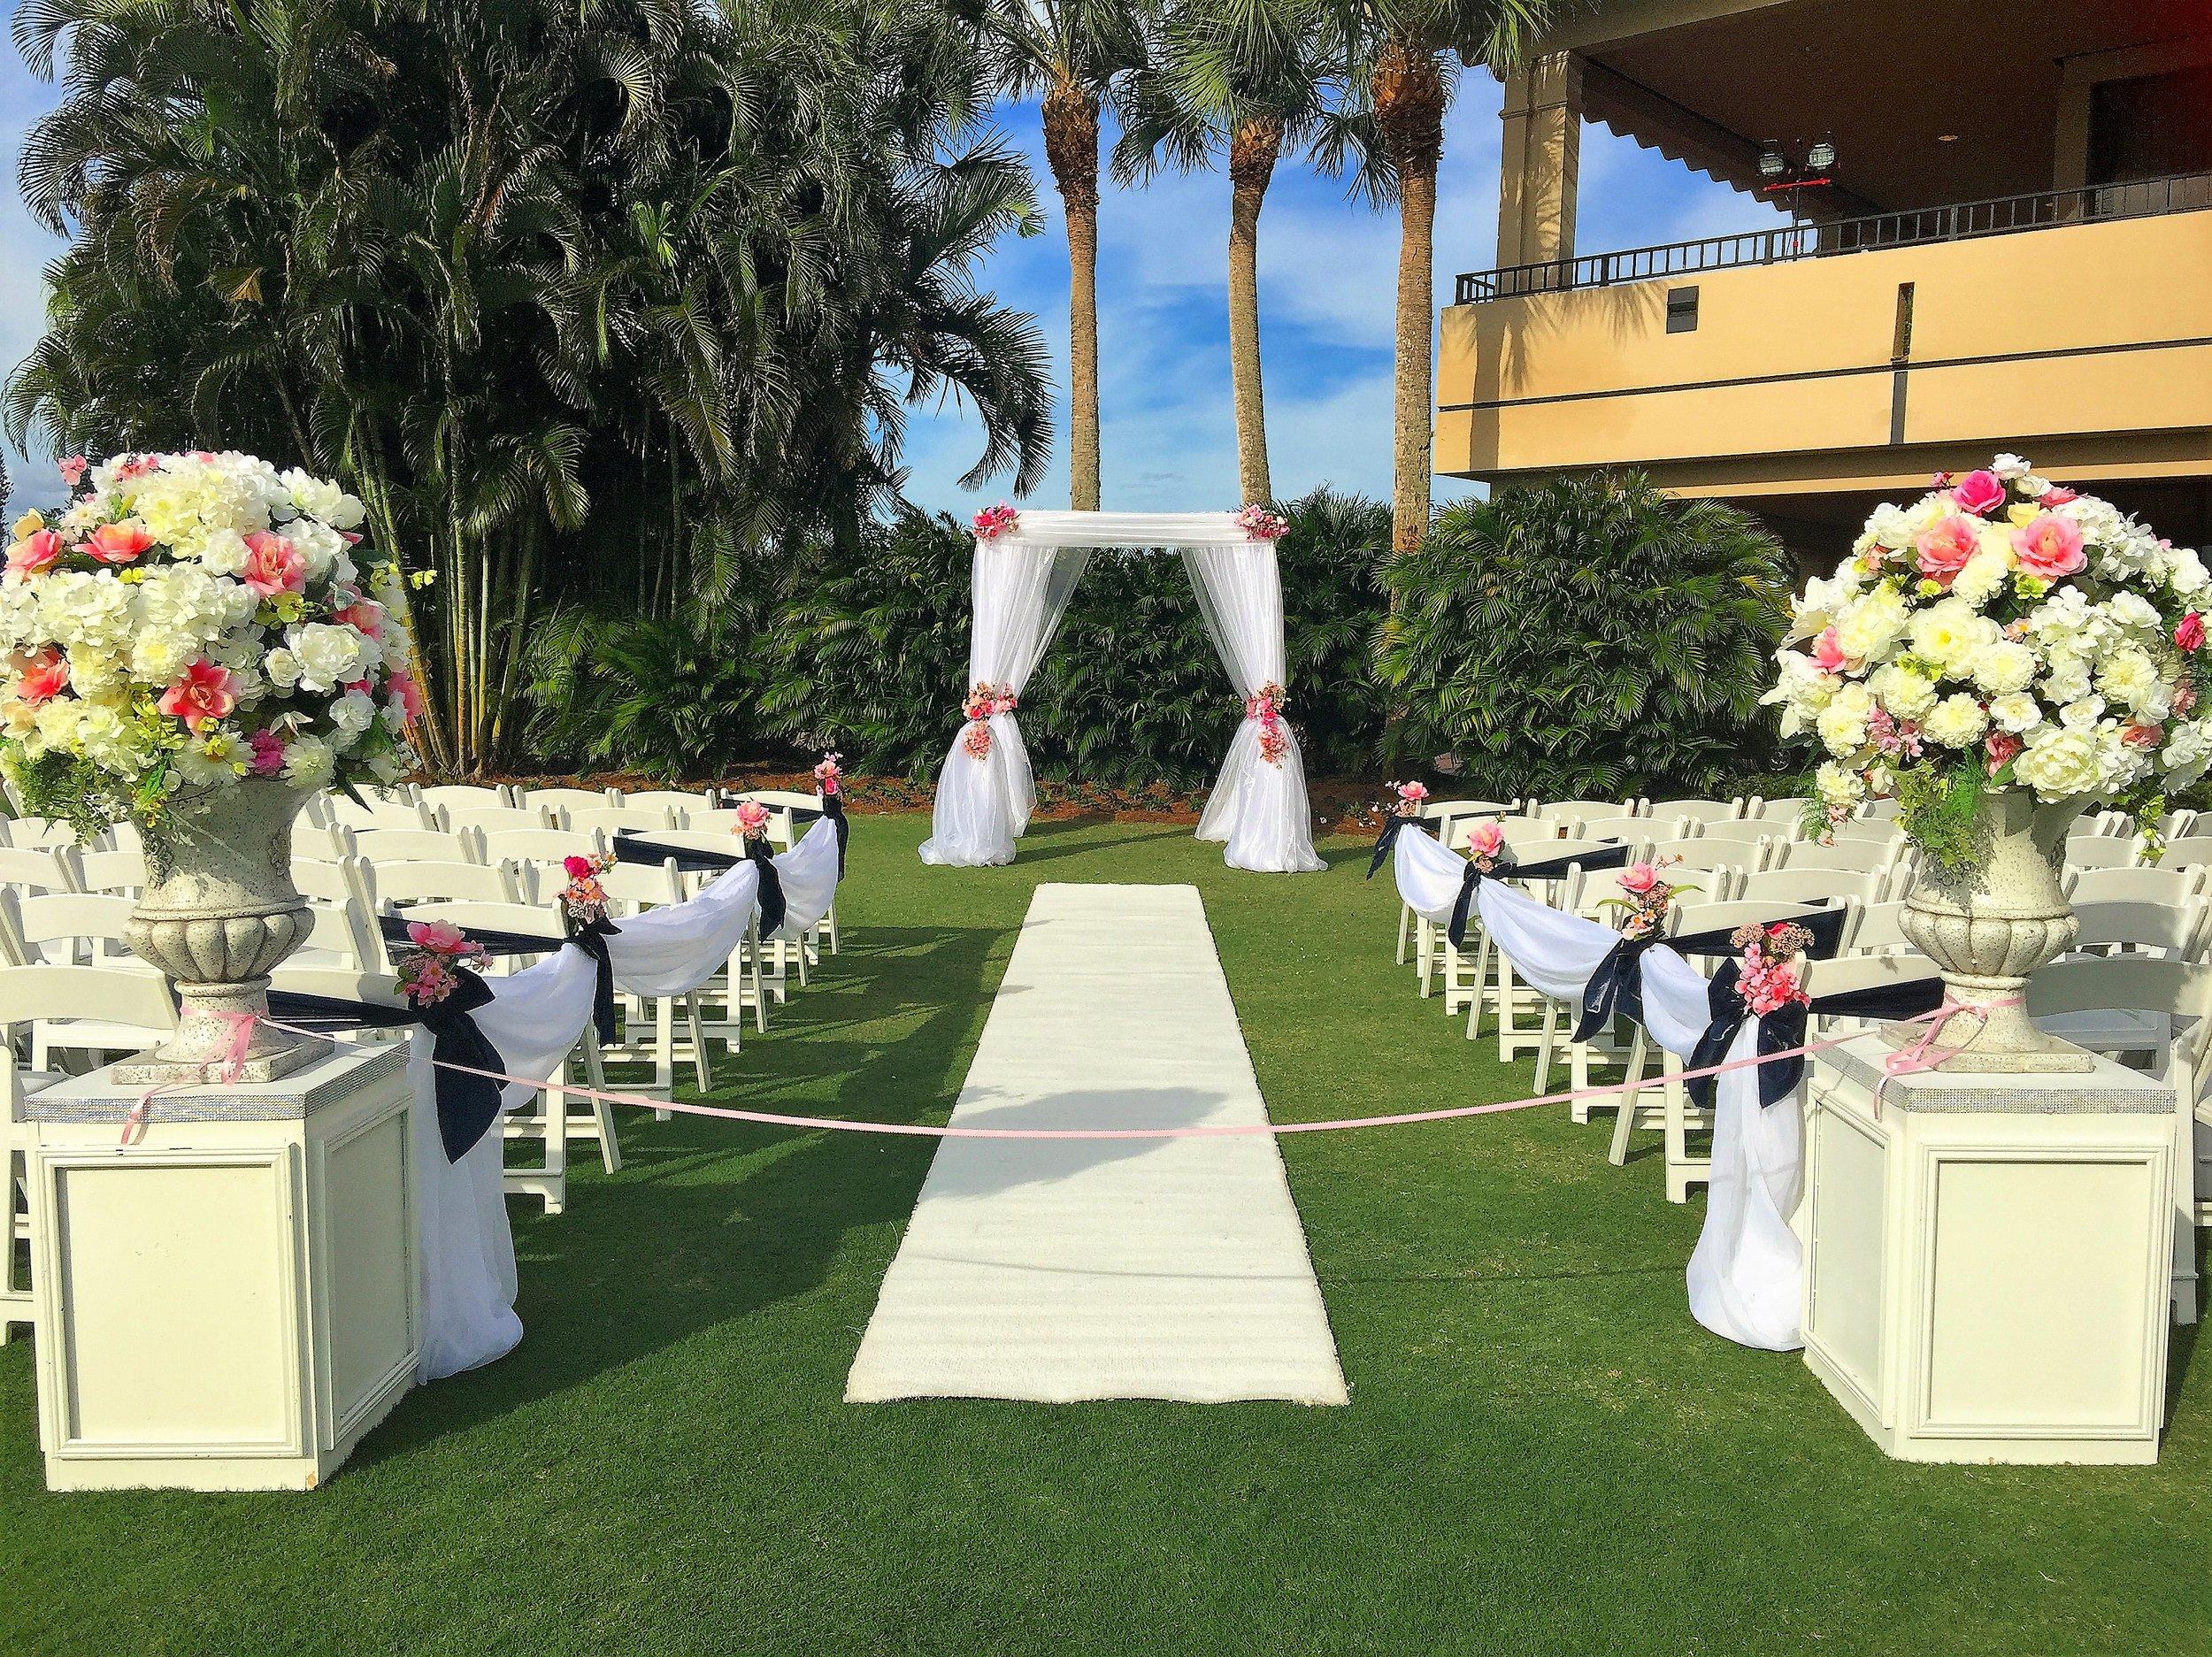 Breakers West Country Club Wedding